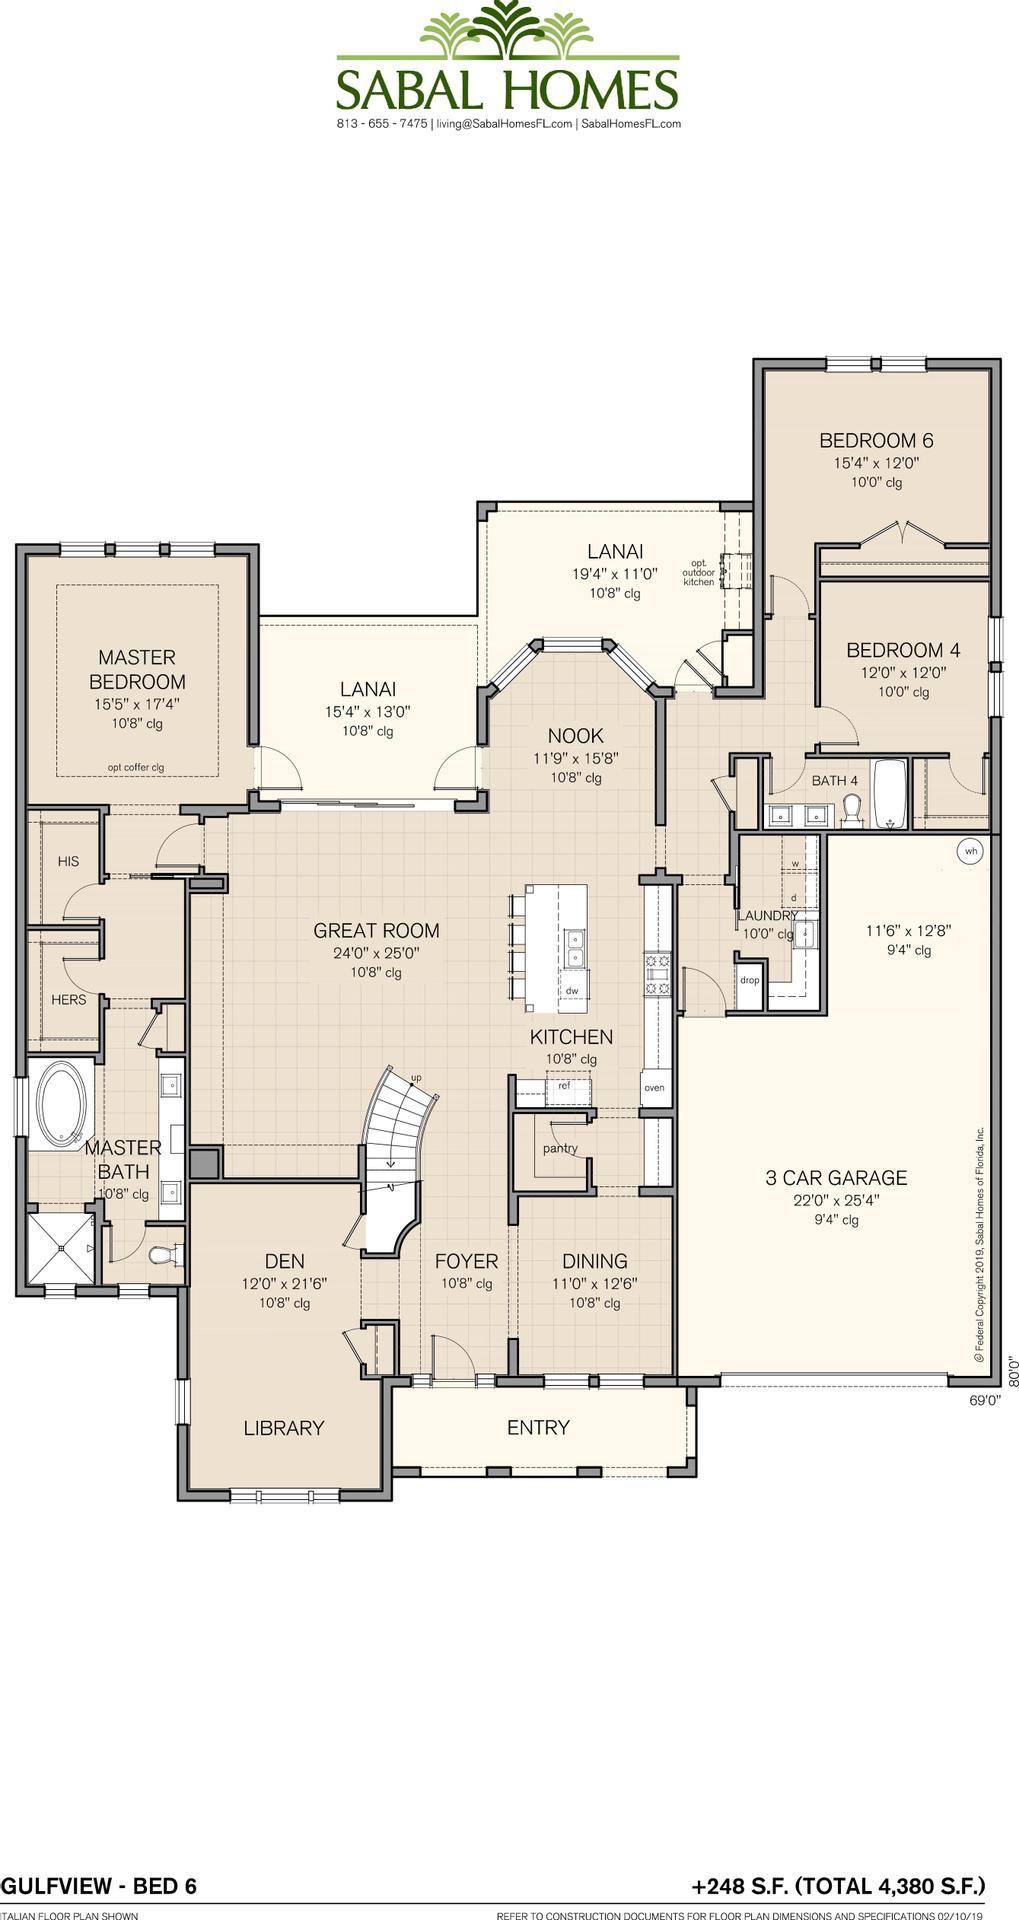 Gulfview 7 BR Plan